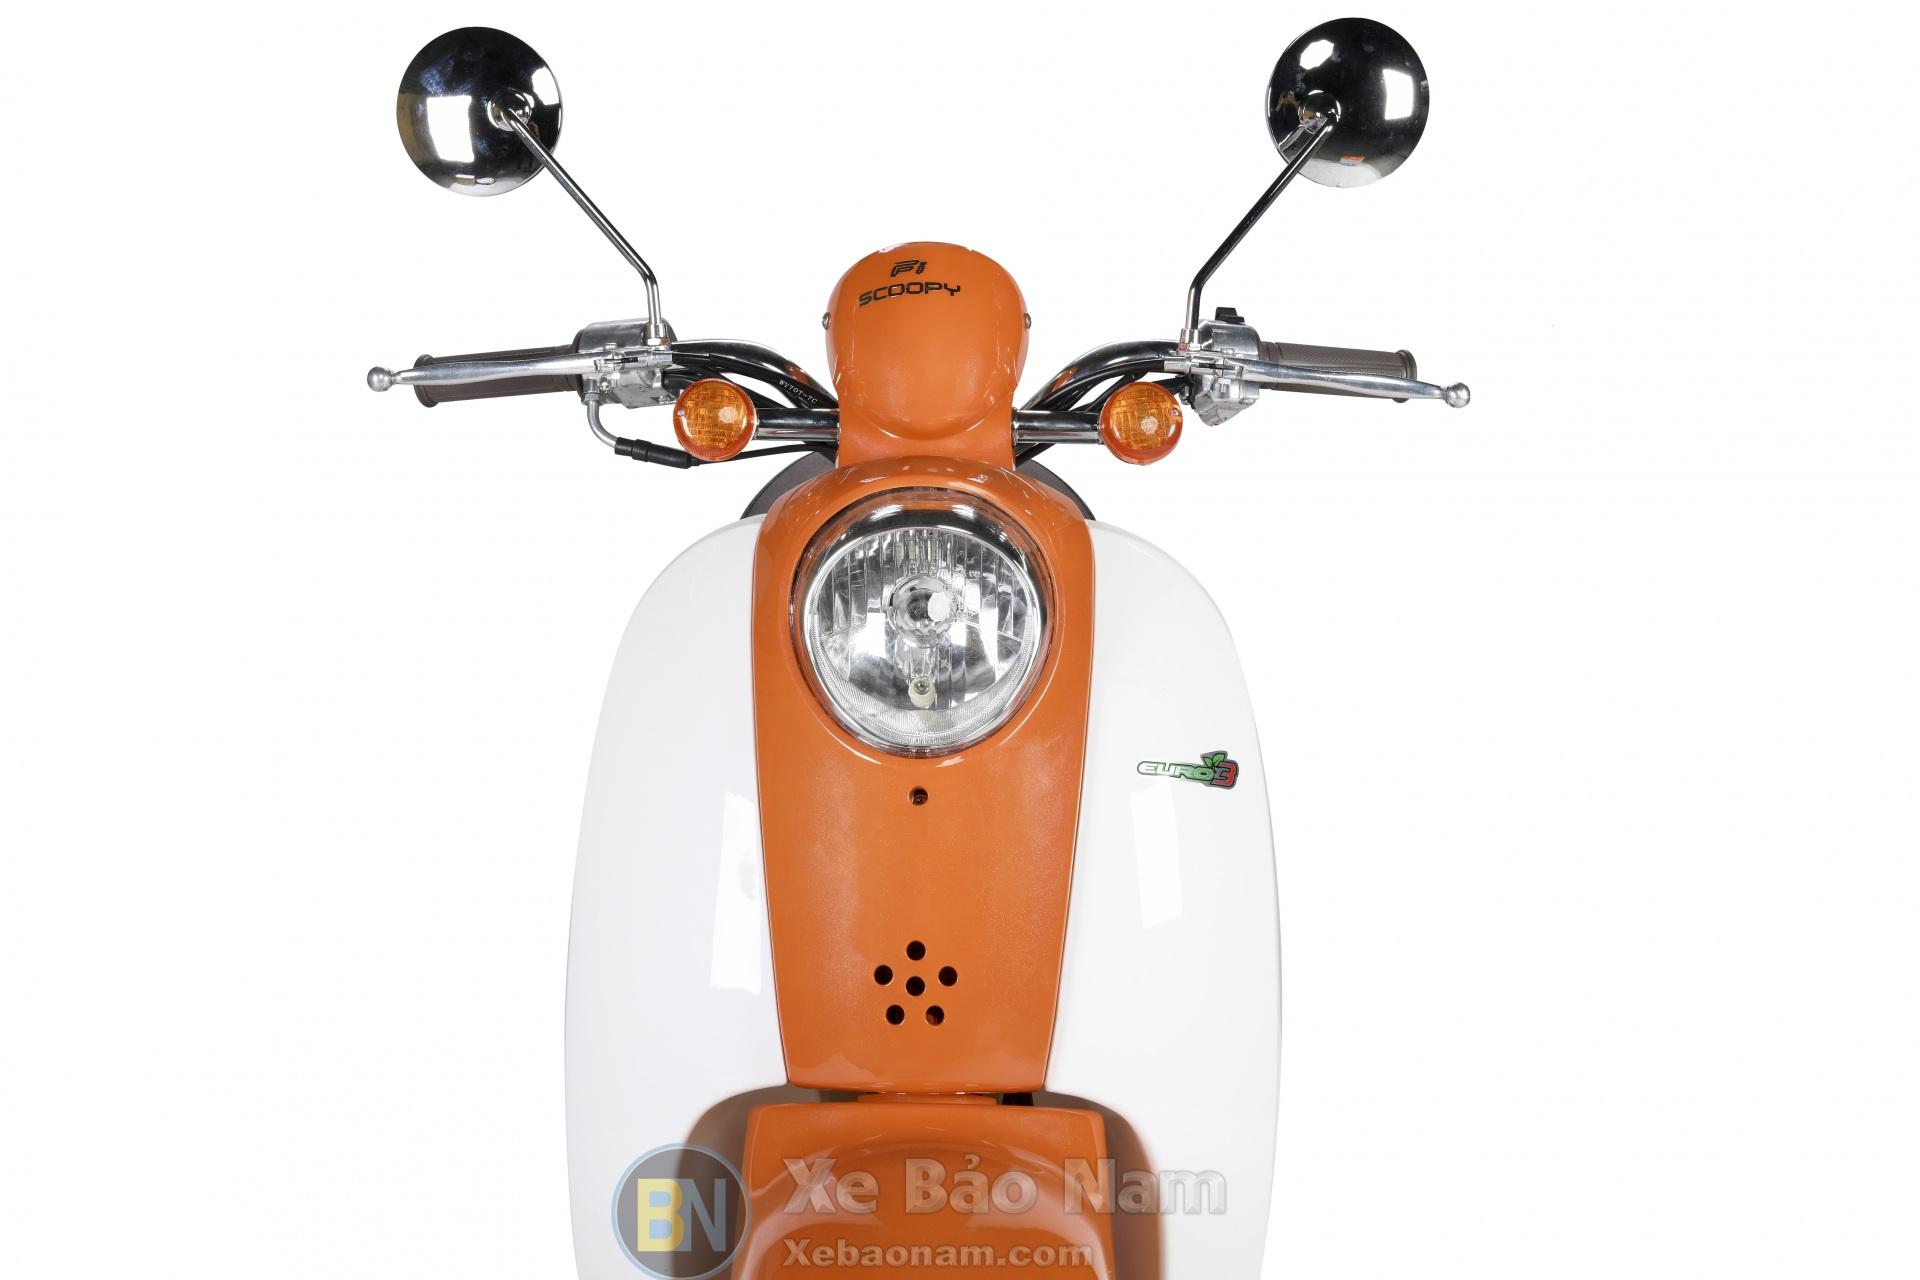 xe-ga-50cc-scoopy-japan-mau-cam-xebaonam-2